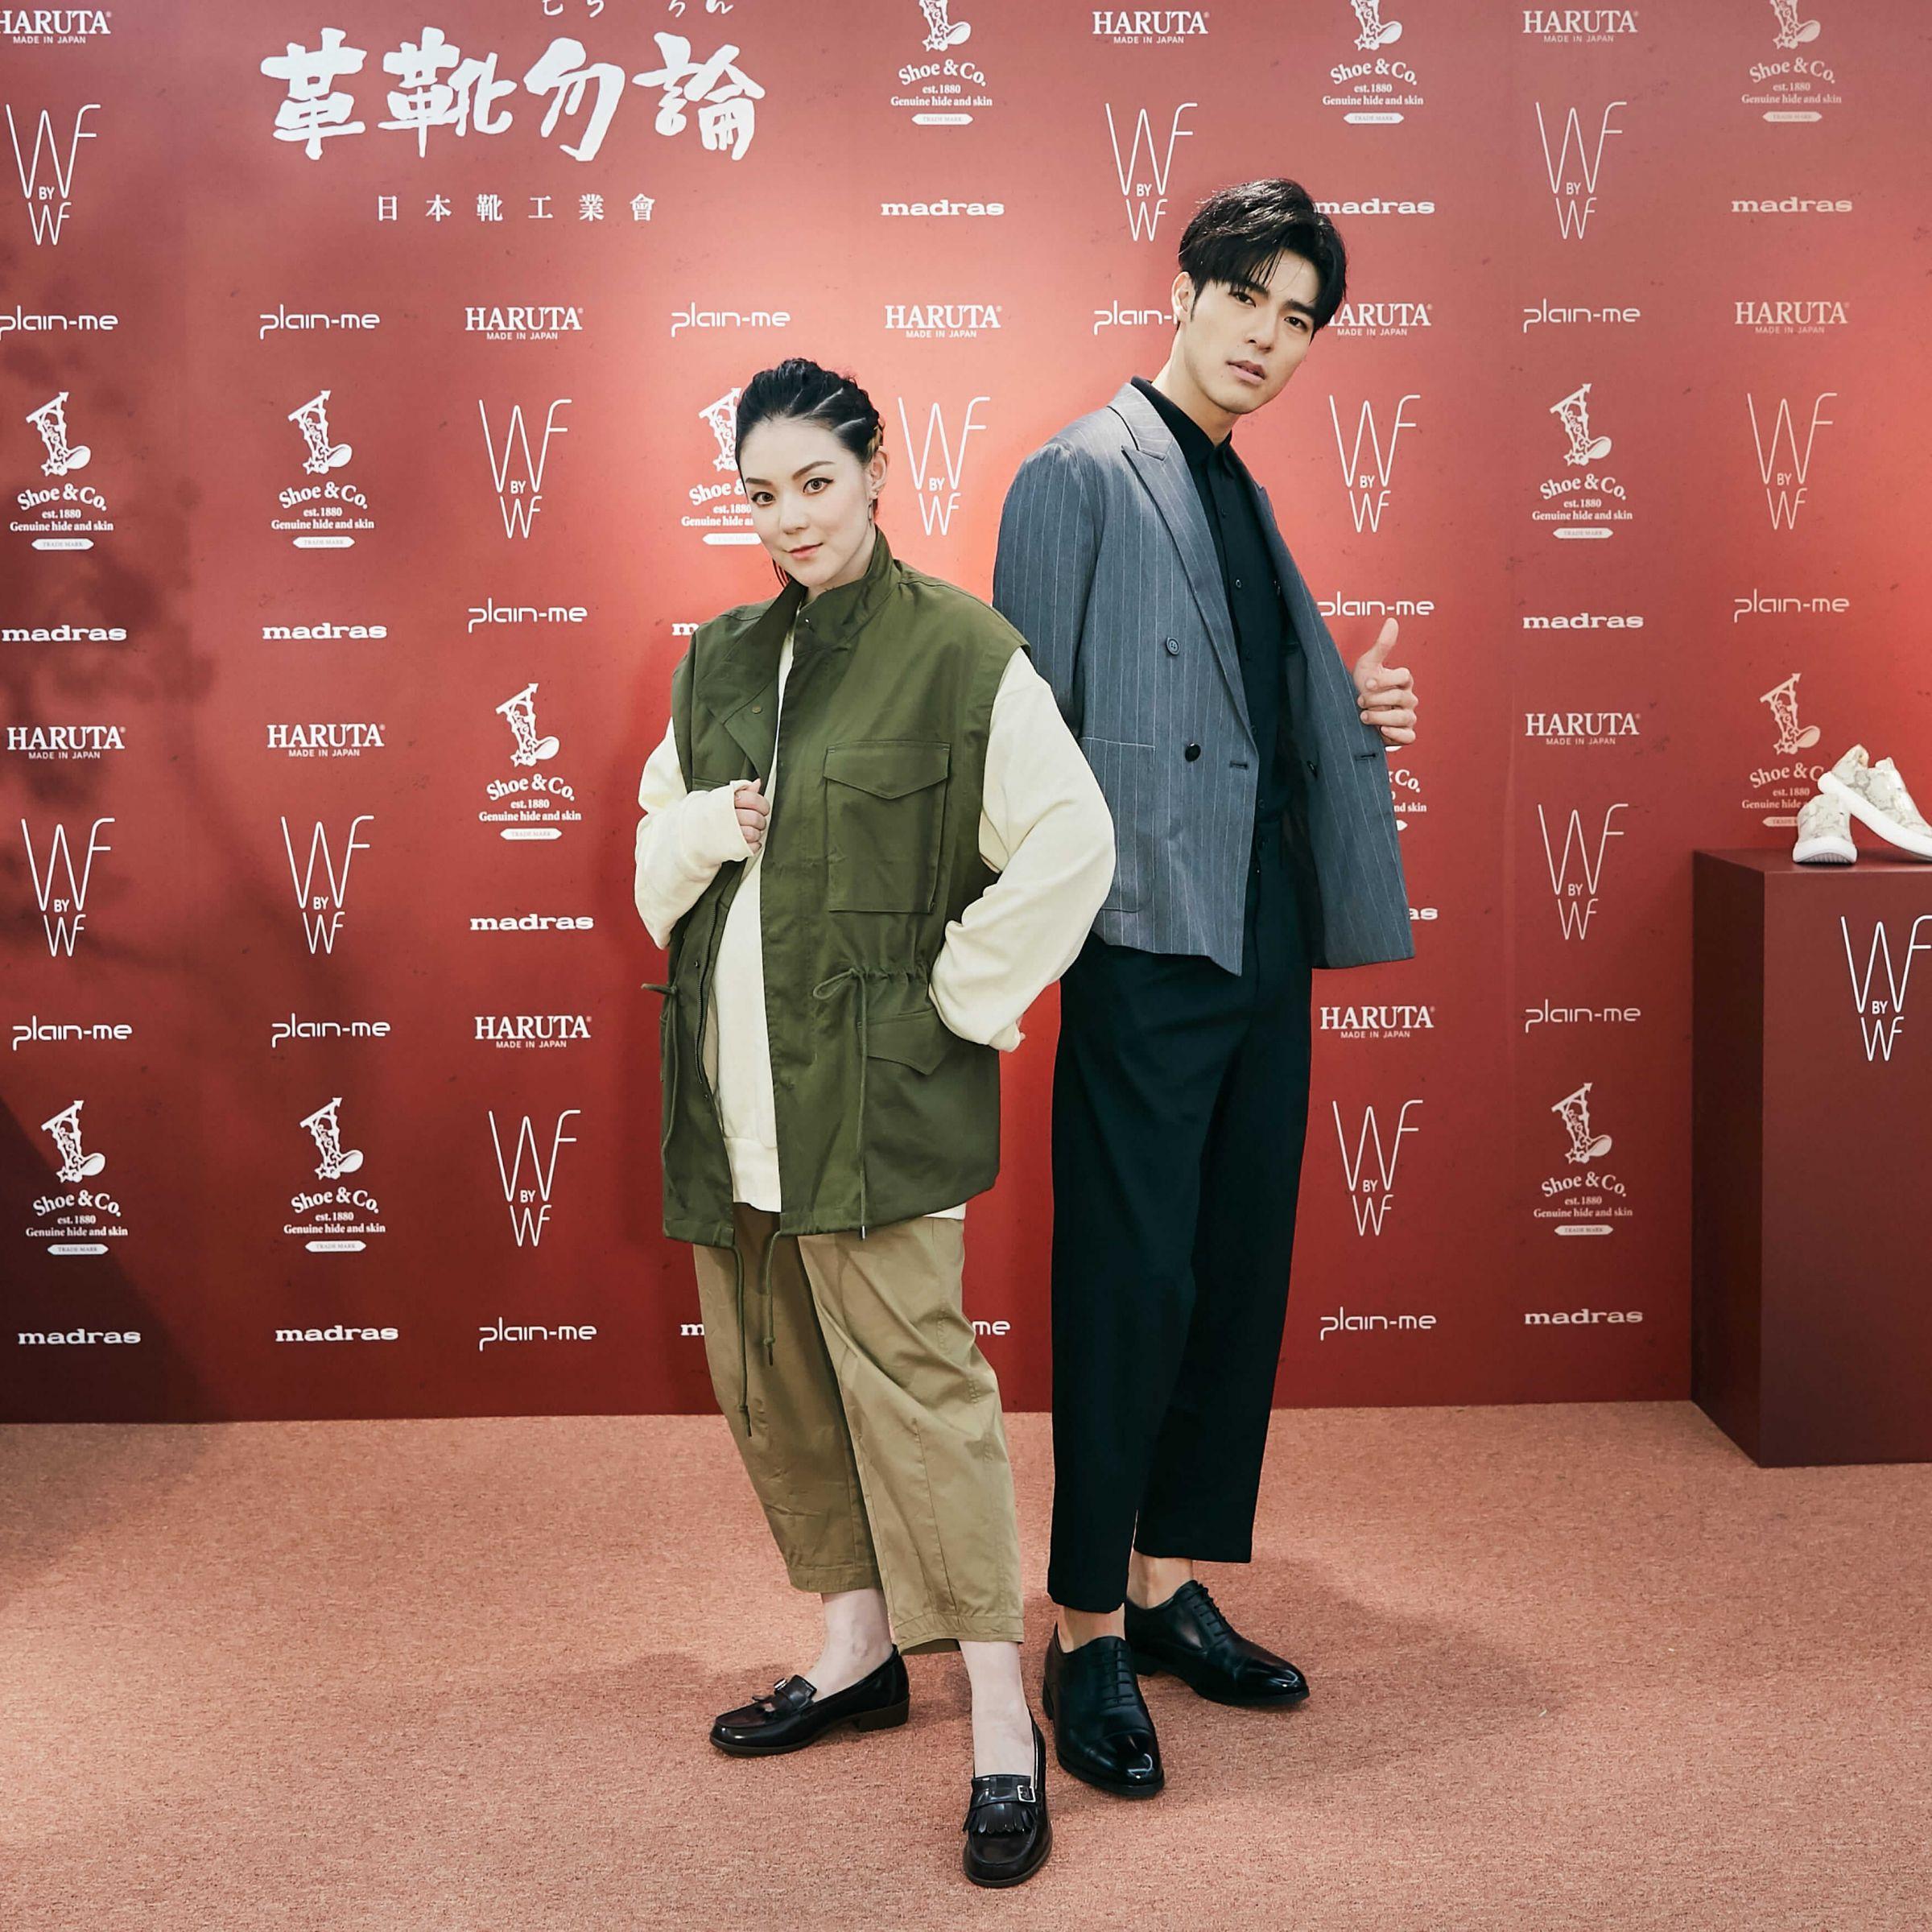 plain-me新品曝光 陳昊森皮鞋LOOK超帥氣!